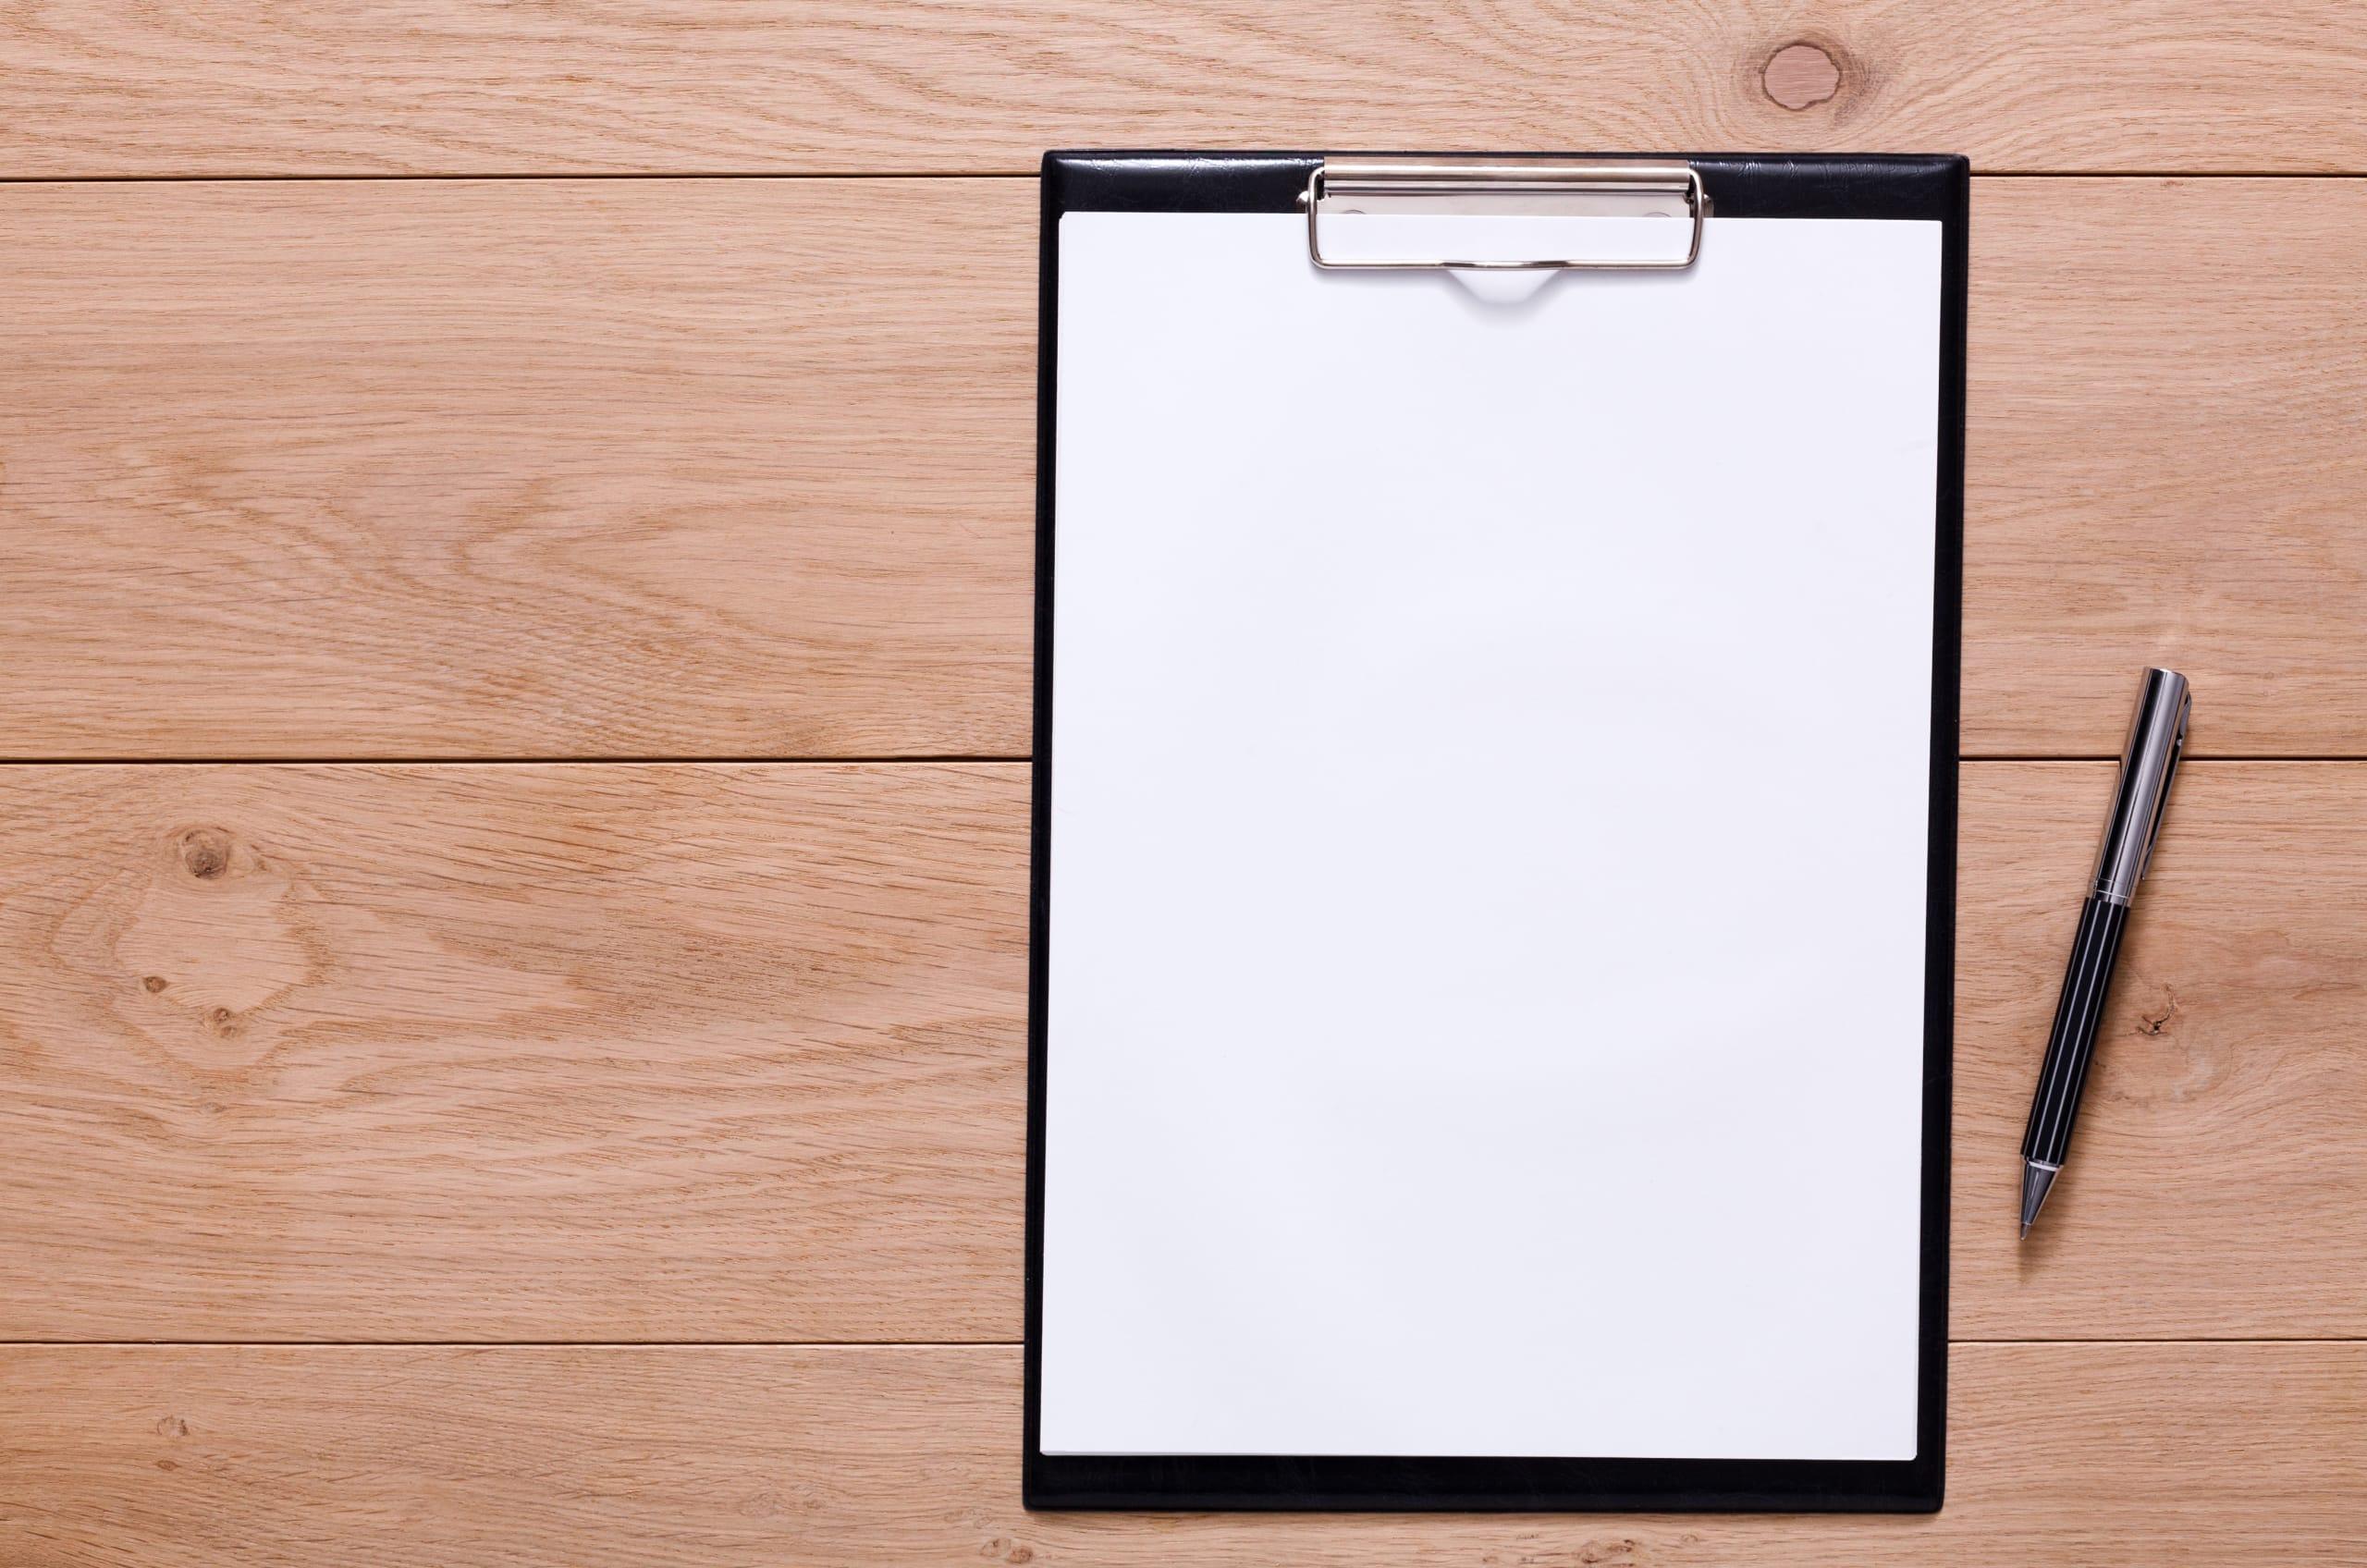 Real Estate Agent Checklist